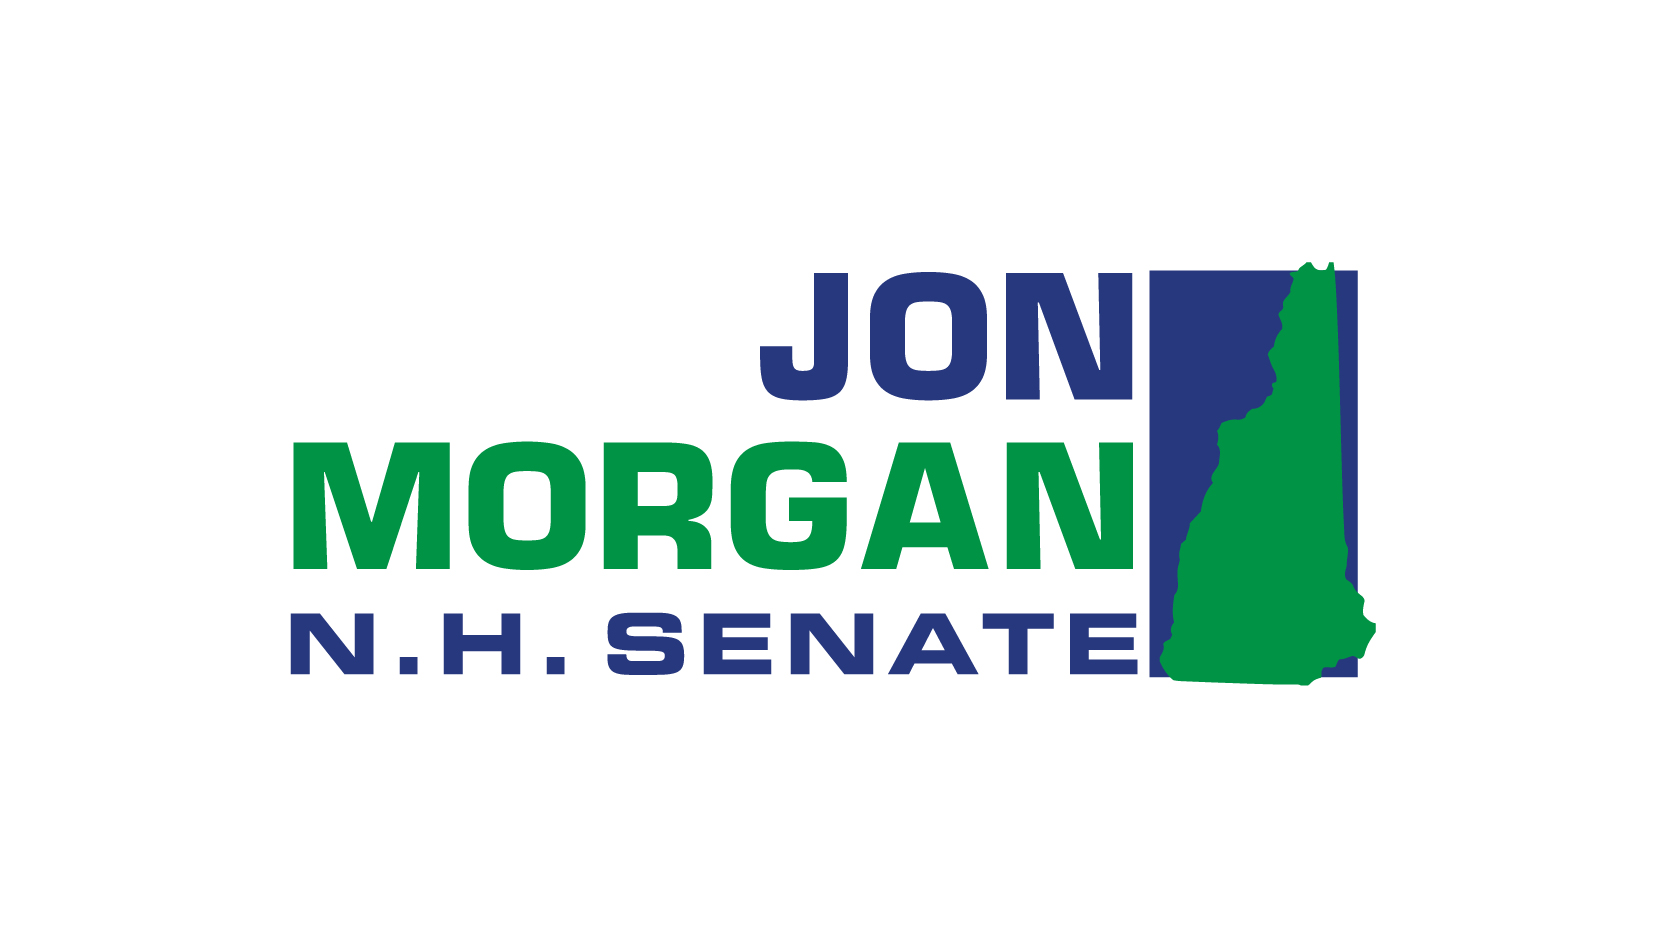 Jon Morgan